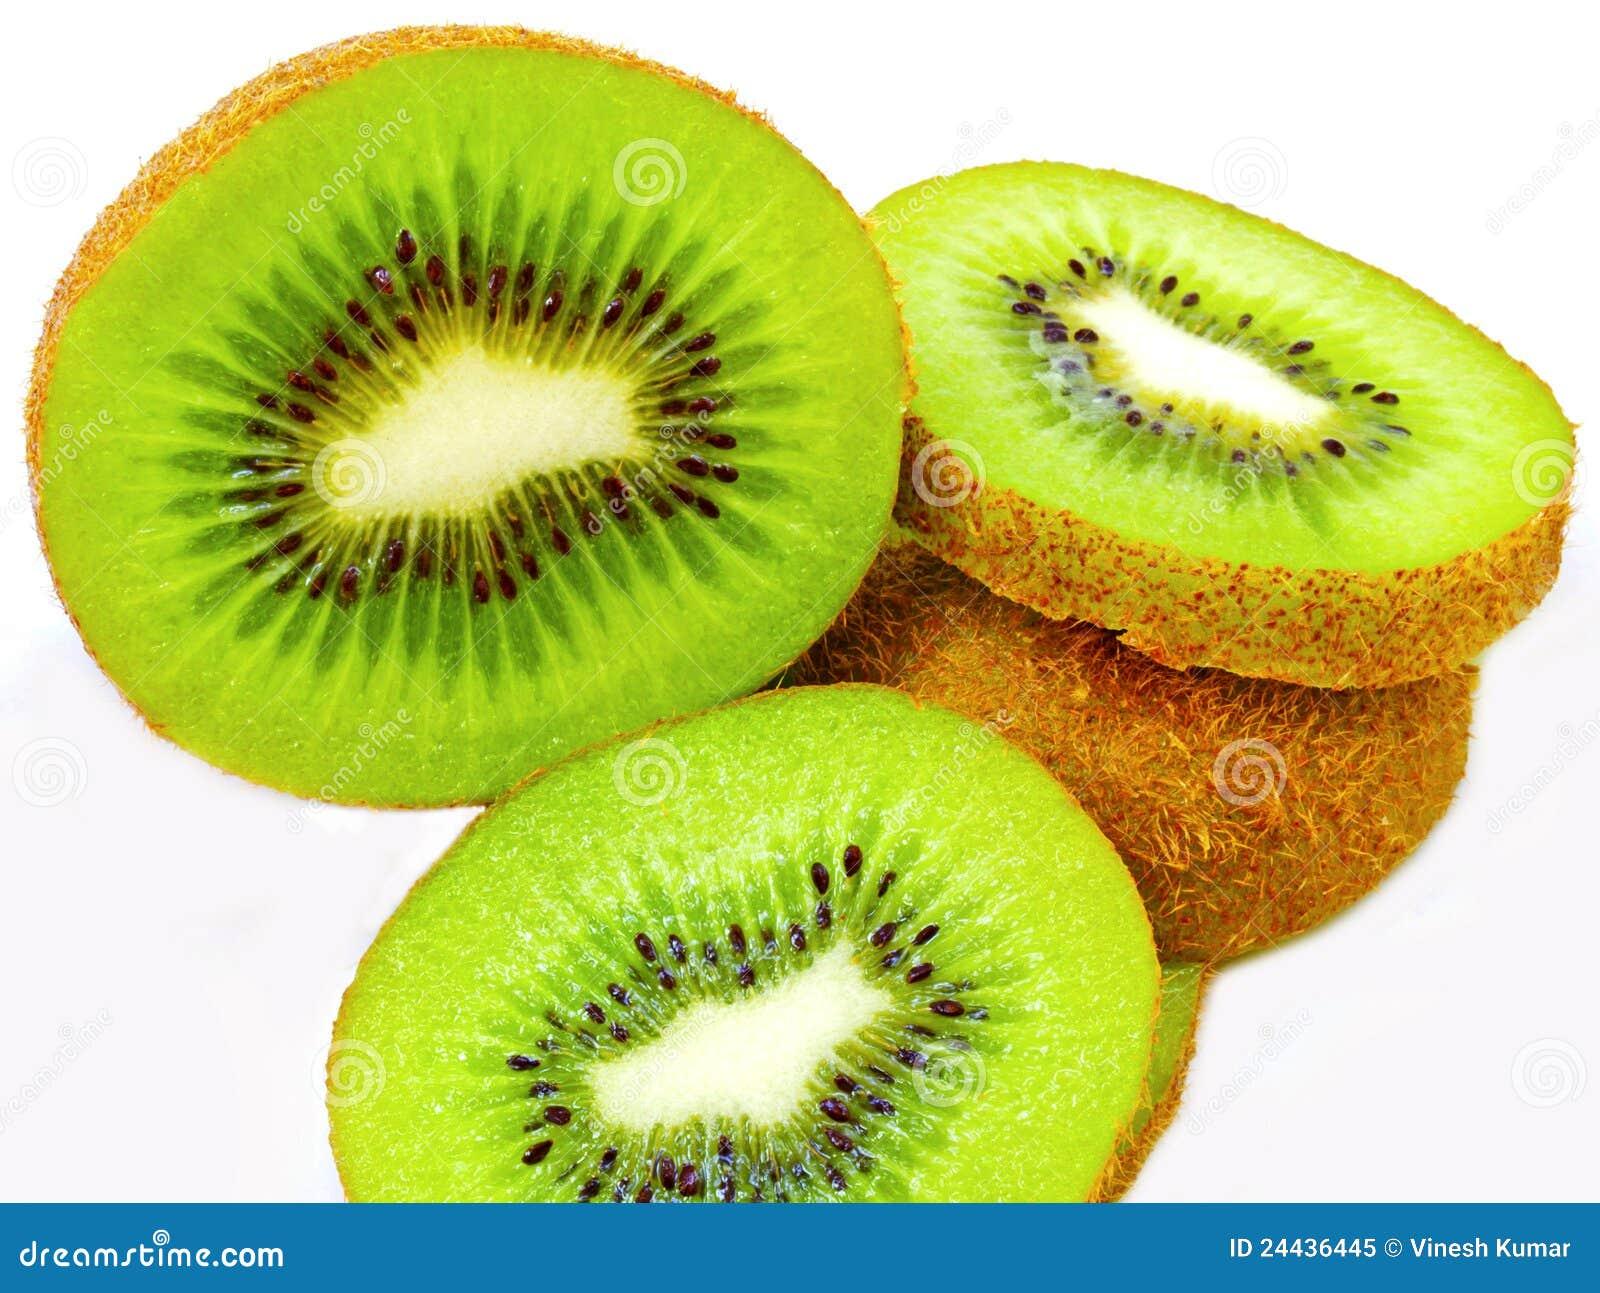 Download Kiwi fruit stock image. Image of cakes, food, juice, fibres - 24436445